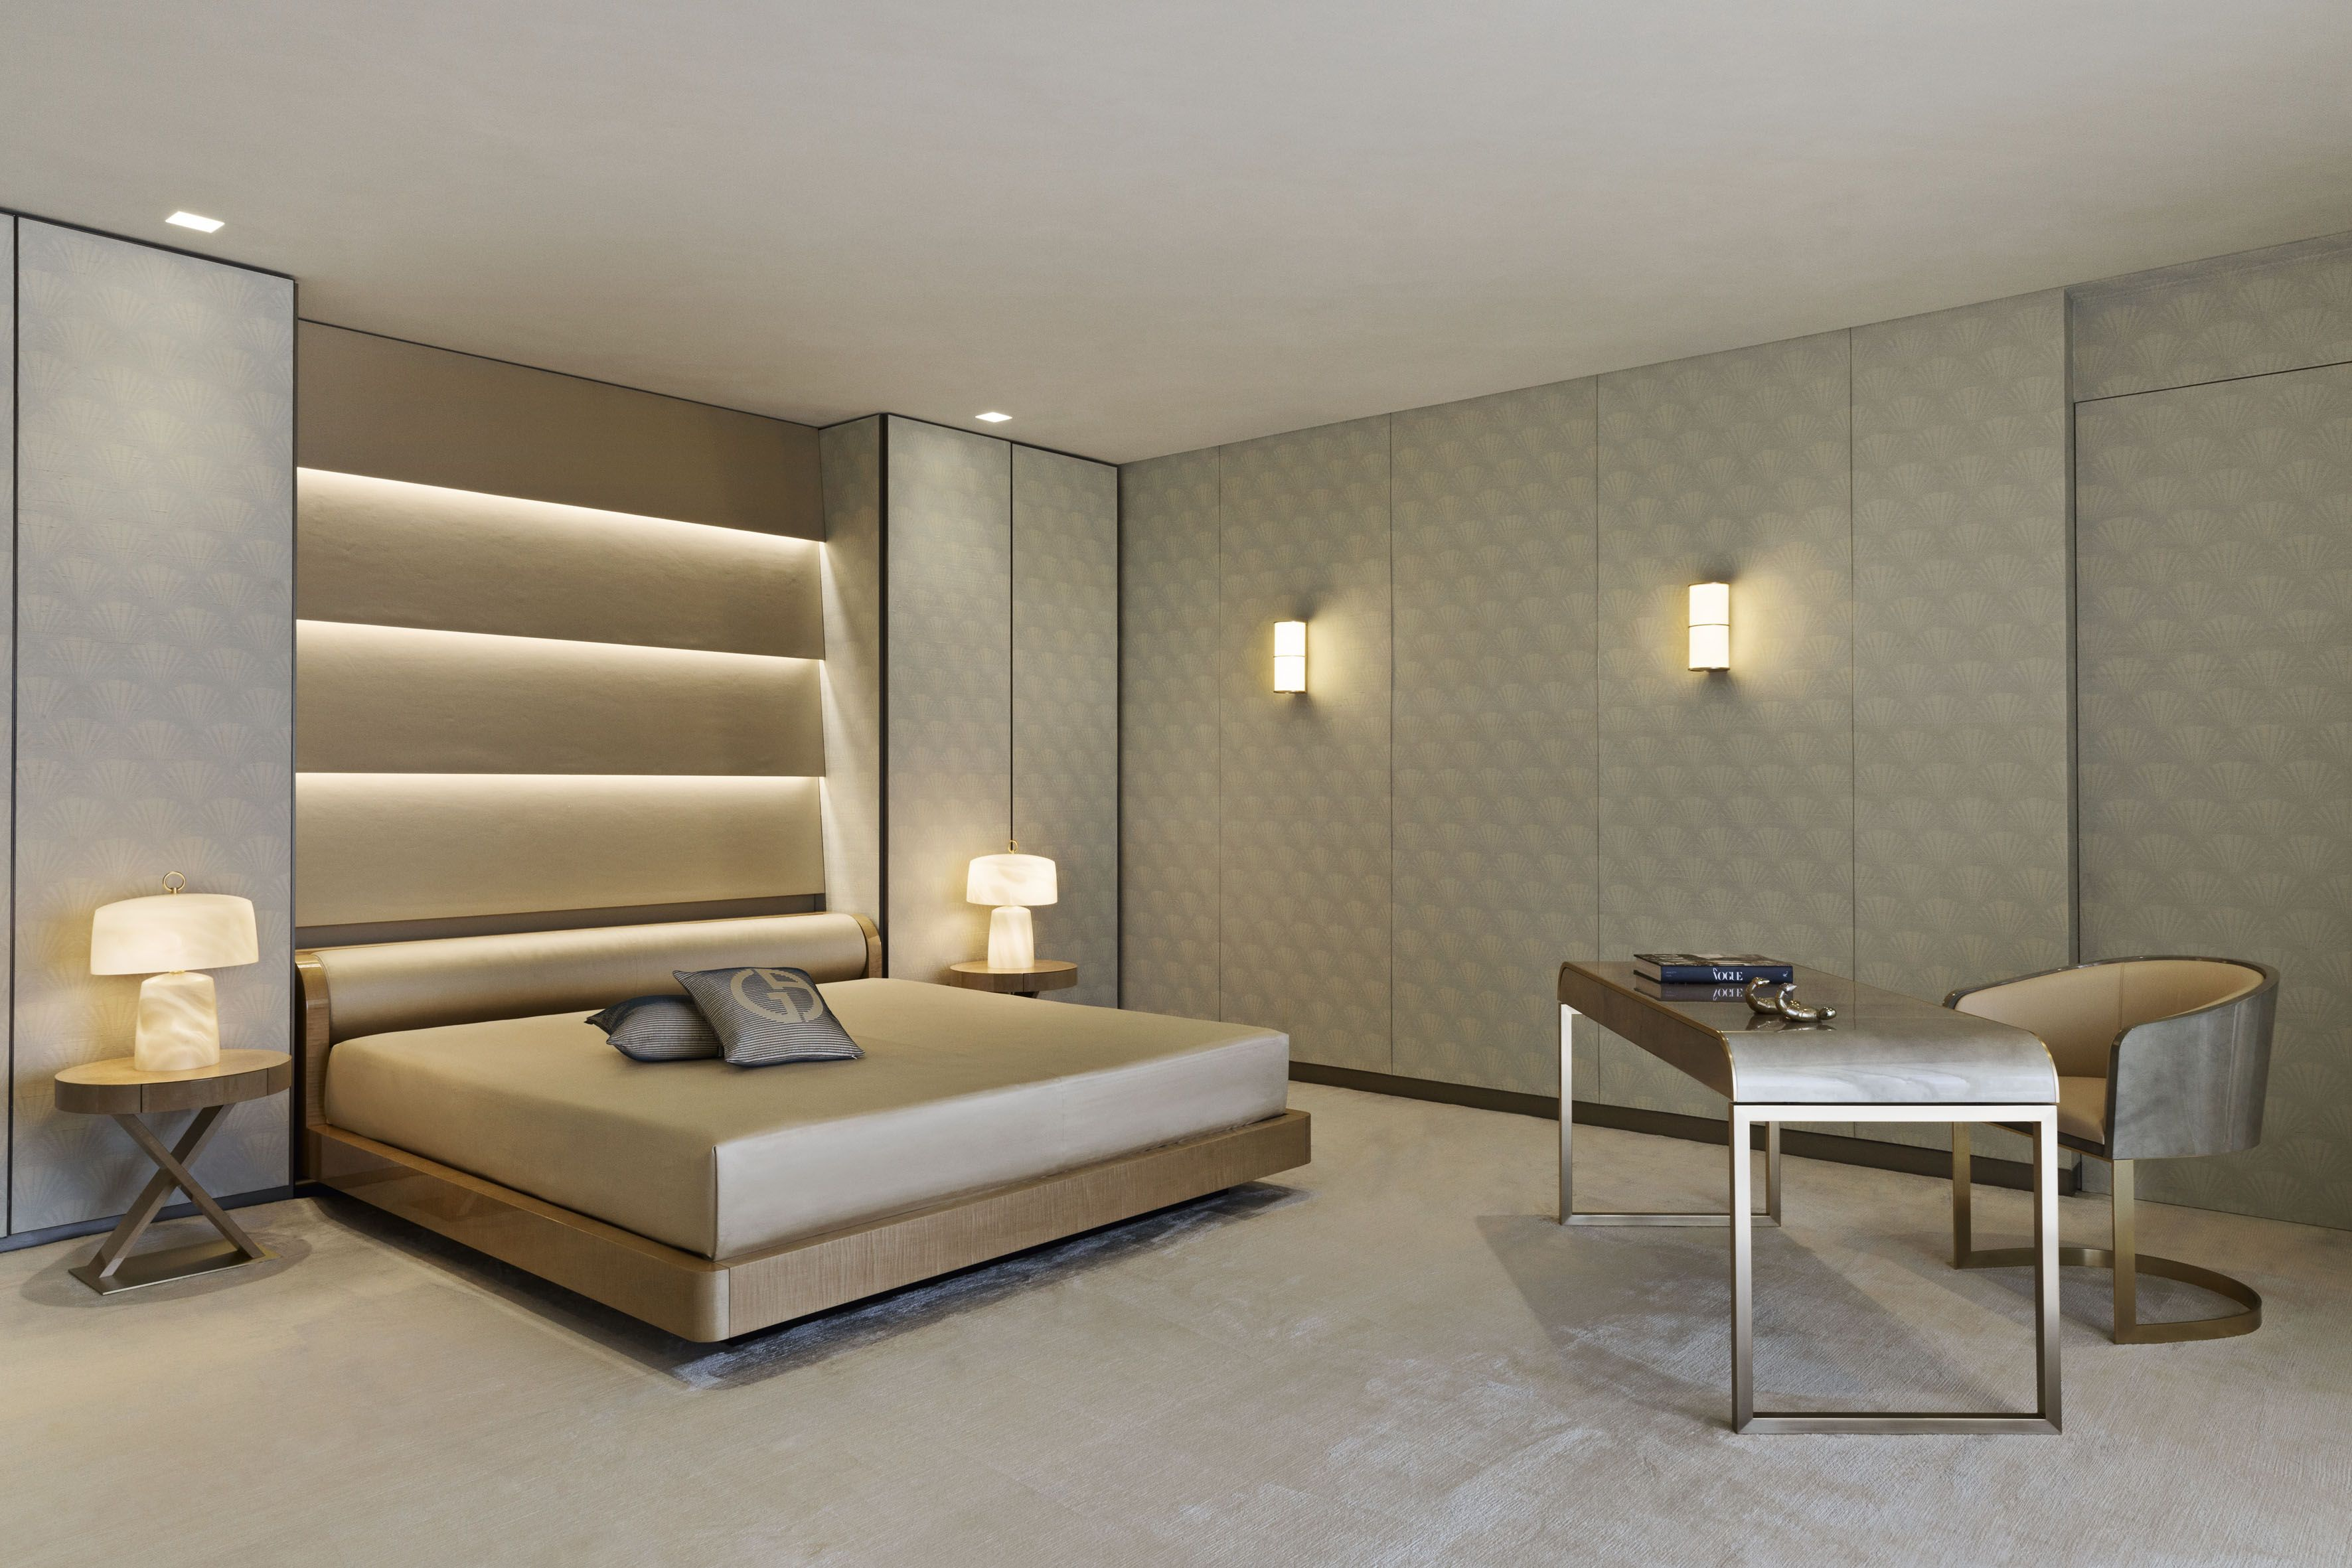 Armani/Casa Miami, The Most Luxurious Condominium in the USA armani casa miami Armani Casa Miami, The Most Luxurious Condominium in the USA dab47d89d3ffa650531b137b7347eaad